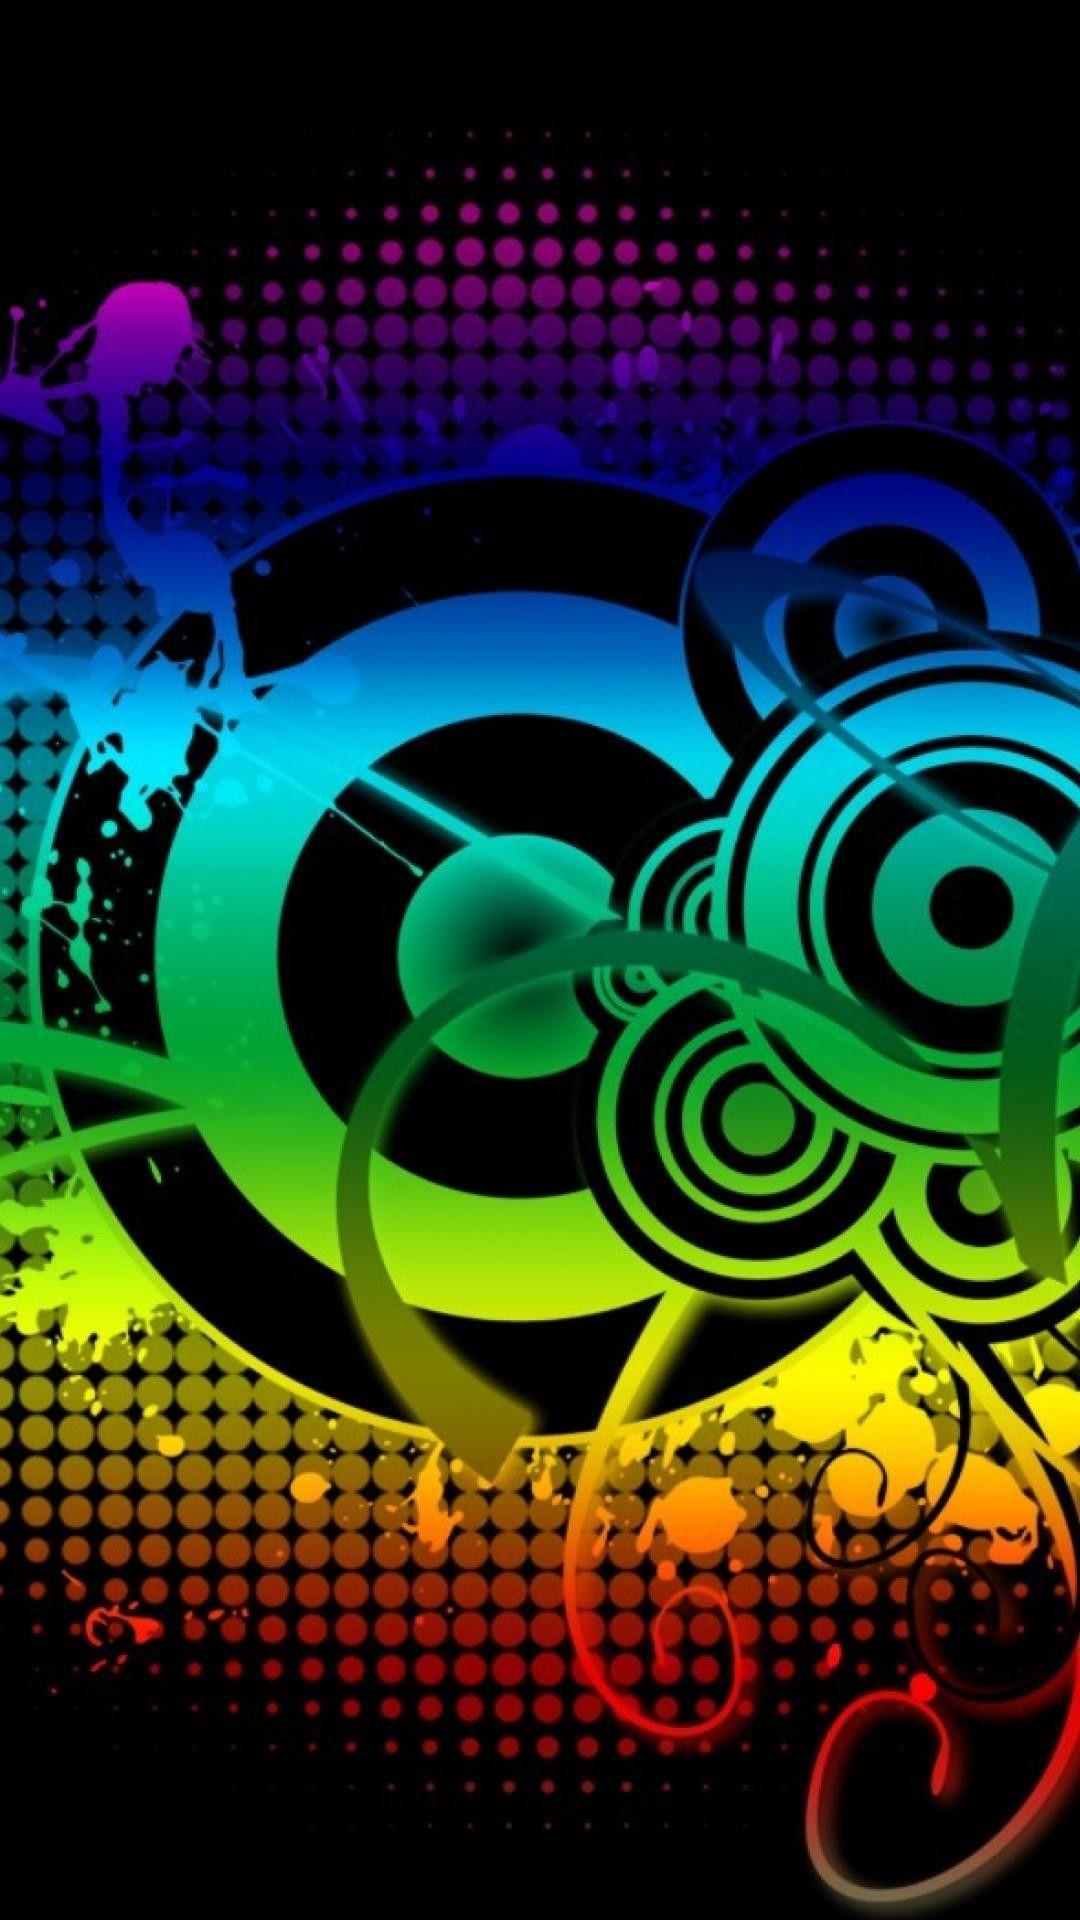 Colorful Music Wallpaper Iphone > Flip Wallpapers